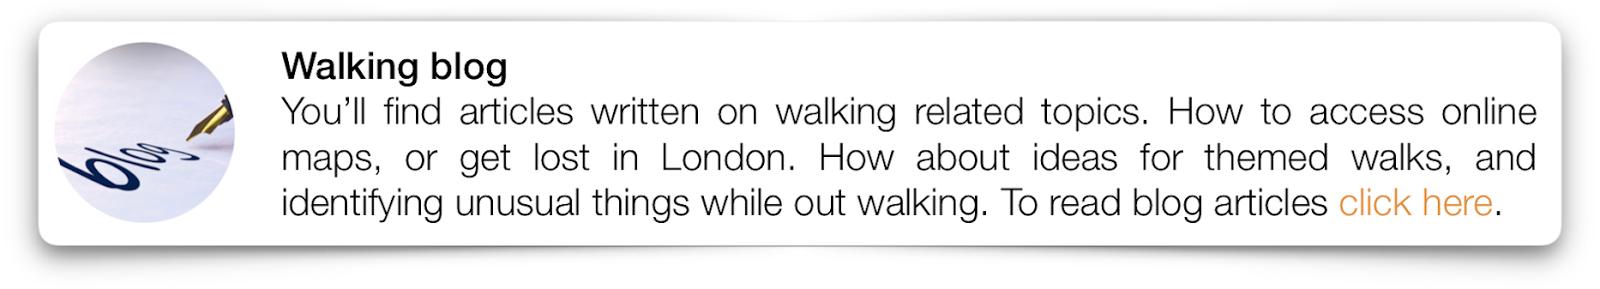 Cambridgeshire Walks walking blog